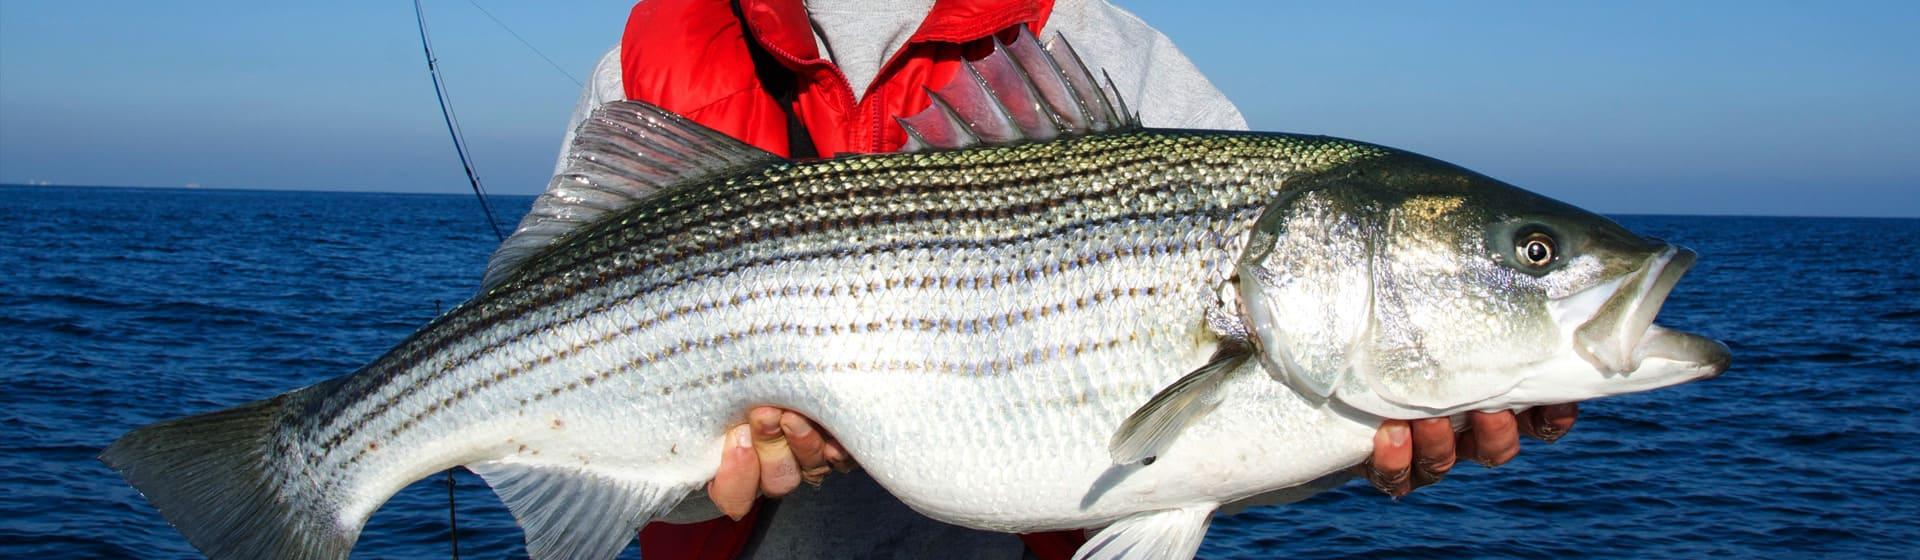 Рыбалка - Детские шорты